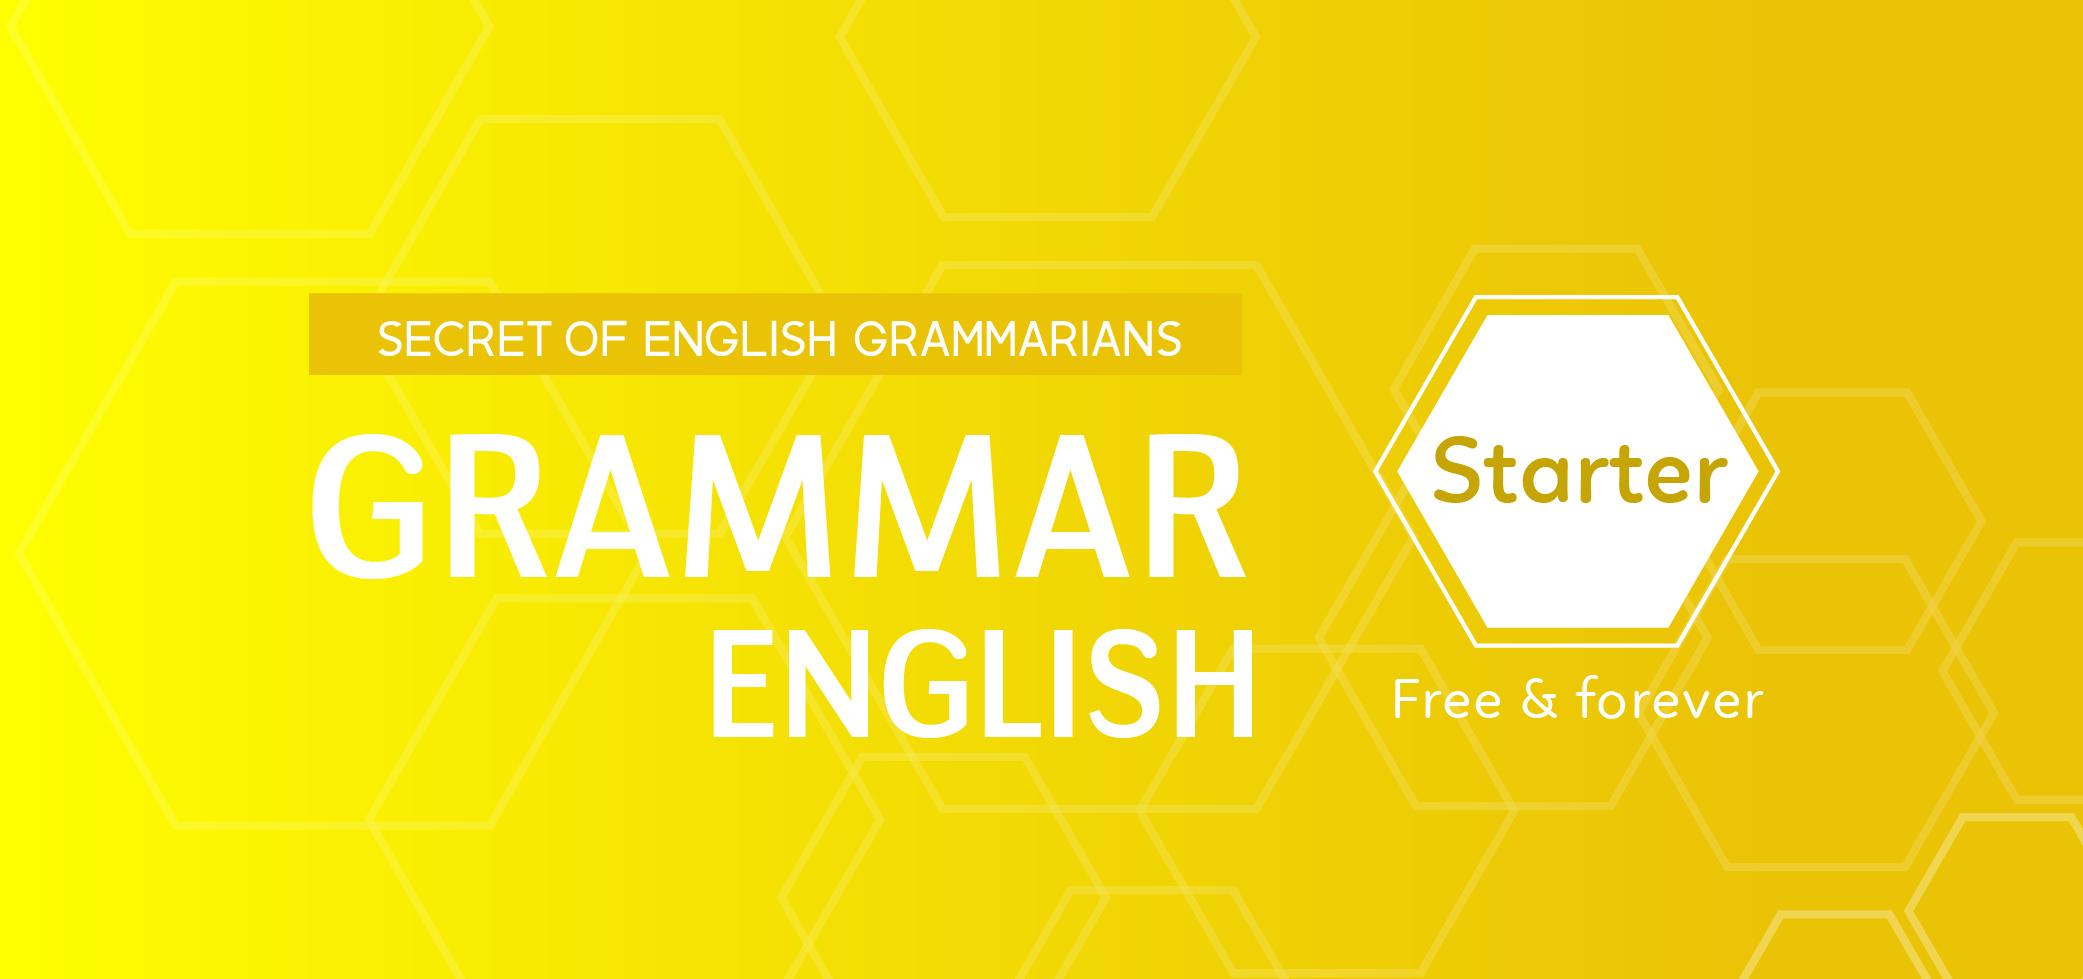 ENGLISH GRAMMAR FOR STARTER